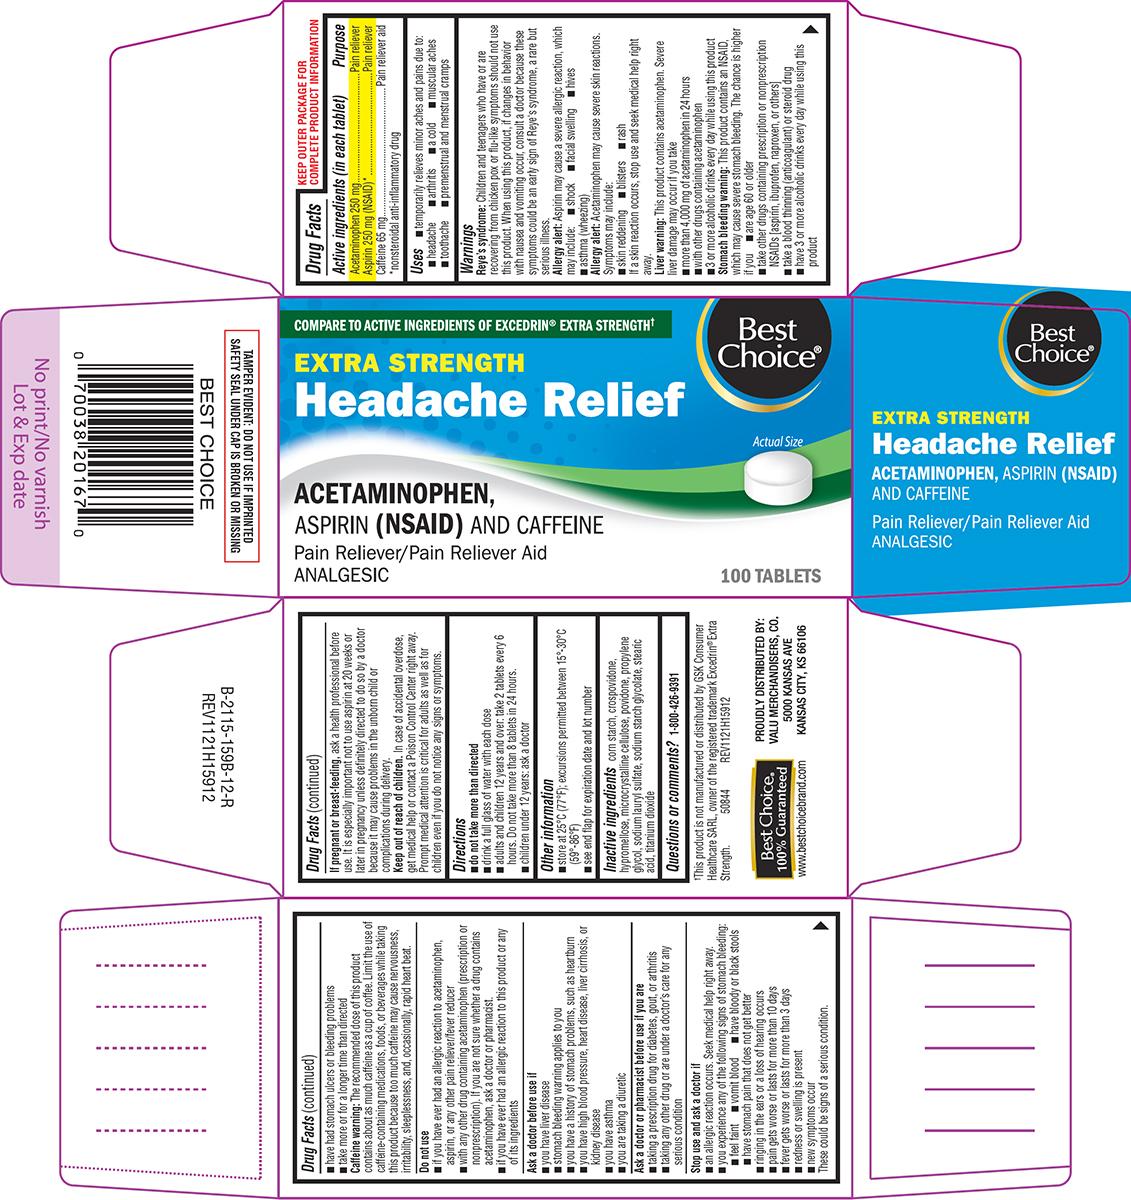 Medroxyprogesterone Acetate Tablet [Blenheim Pharmacal, Inc.]